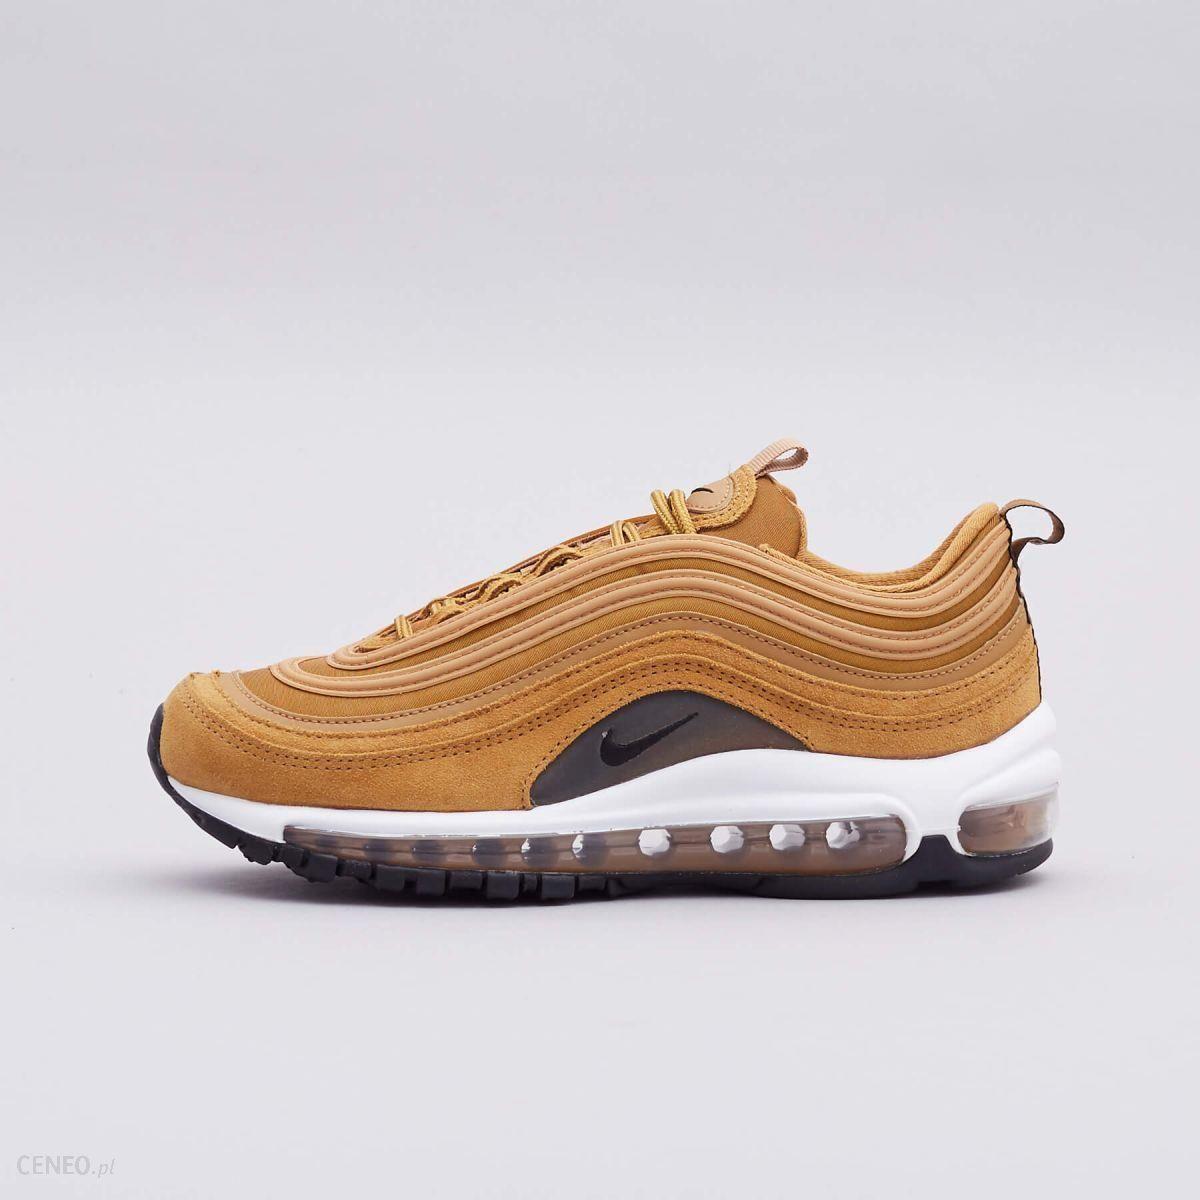 NIKE W AIR MAX 97 SE BL AV8198 200 | kolor RÓŻOWY | Damskie Sneakersy | Buty w ✪ Sklep Sizeer ✪